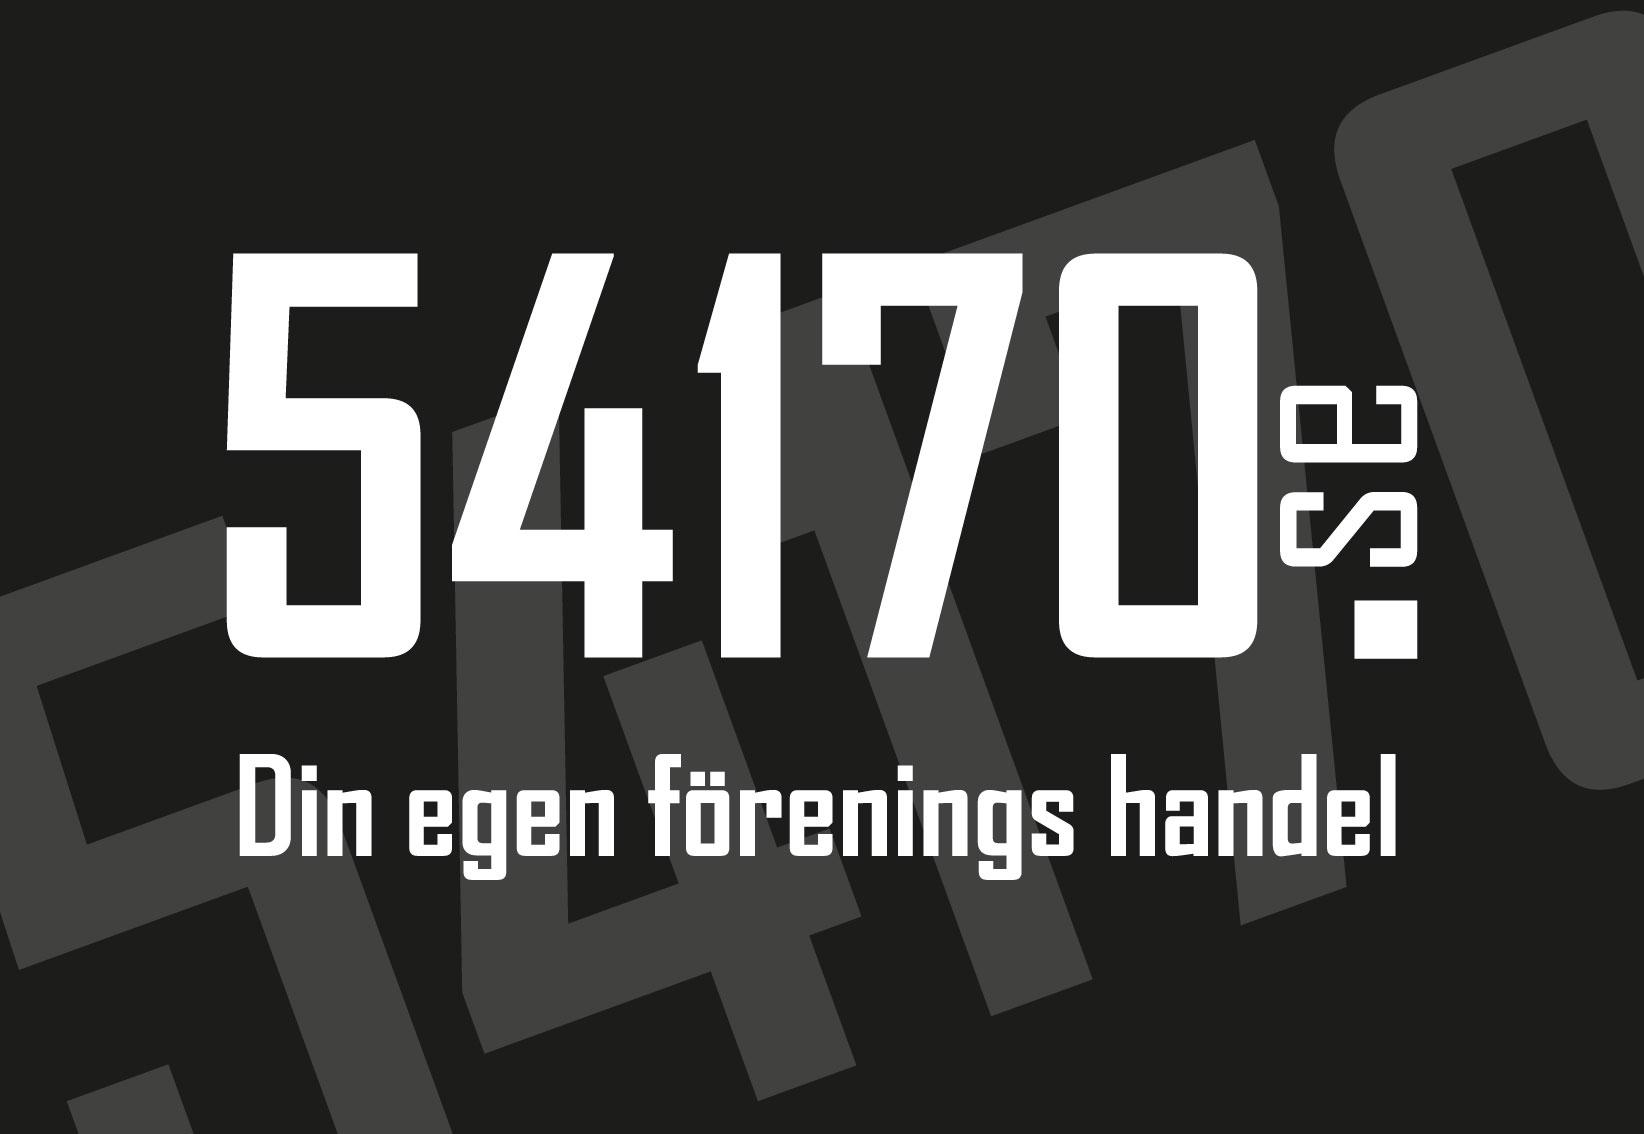 54170.se